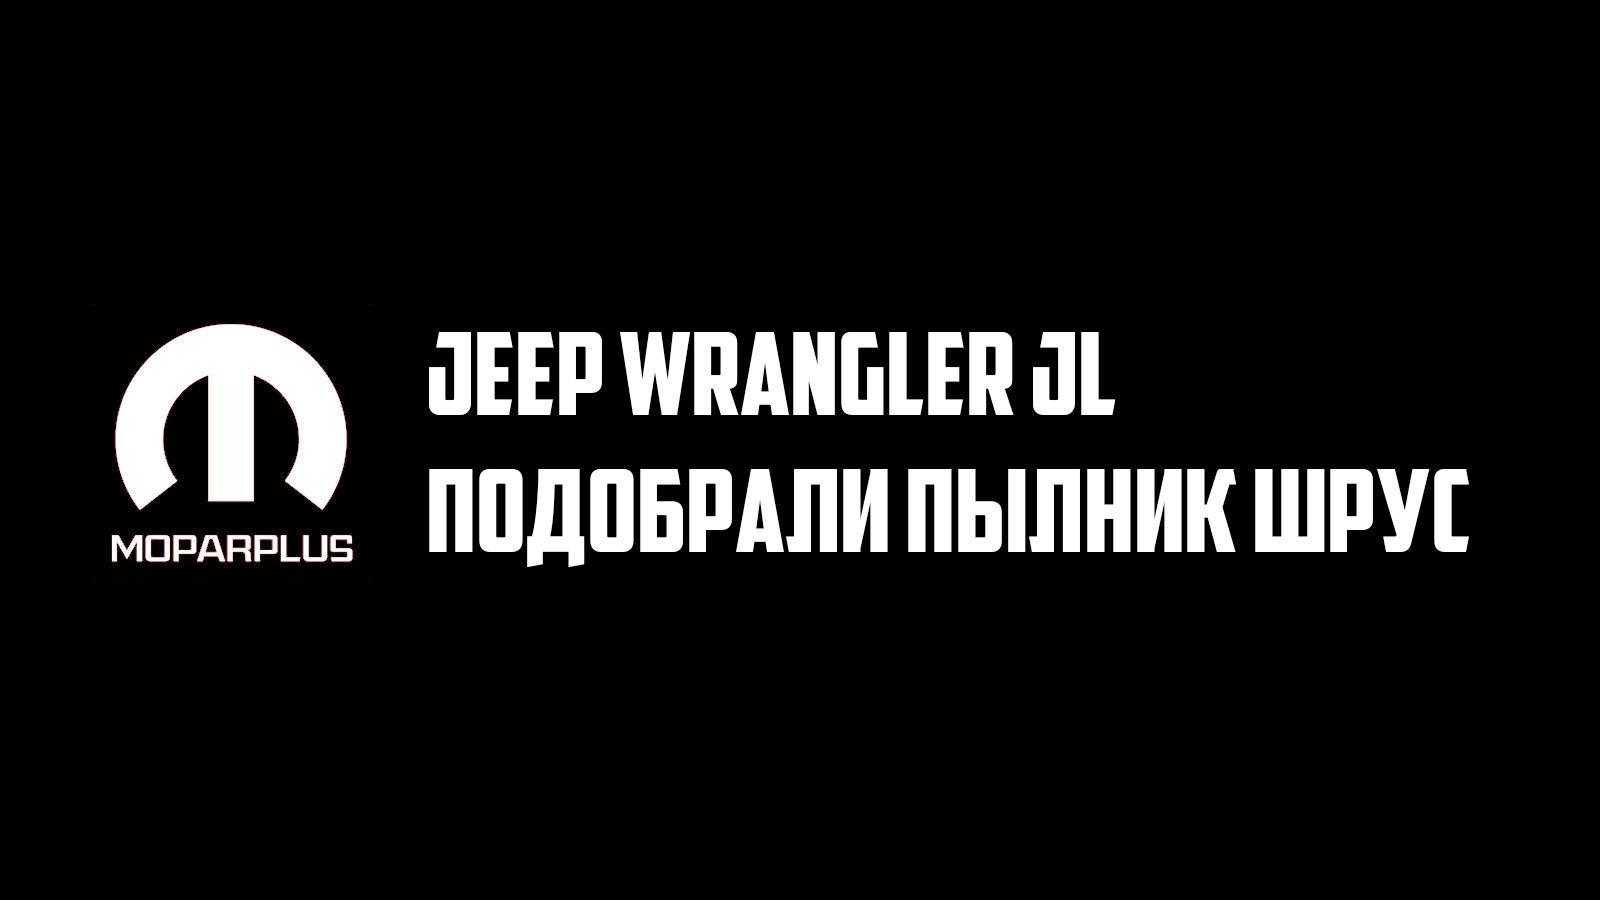 Пыльник ШРУС Jeep Wrangler JL